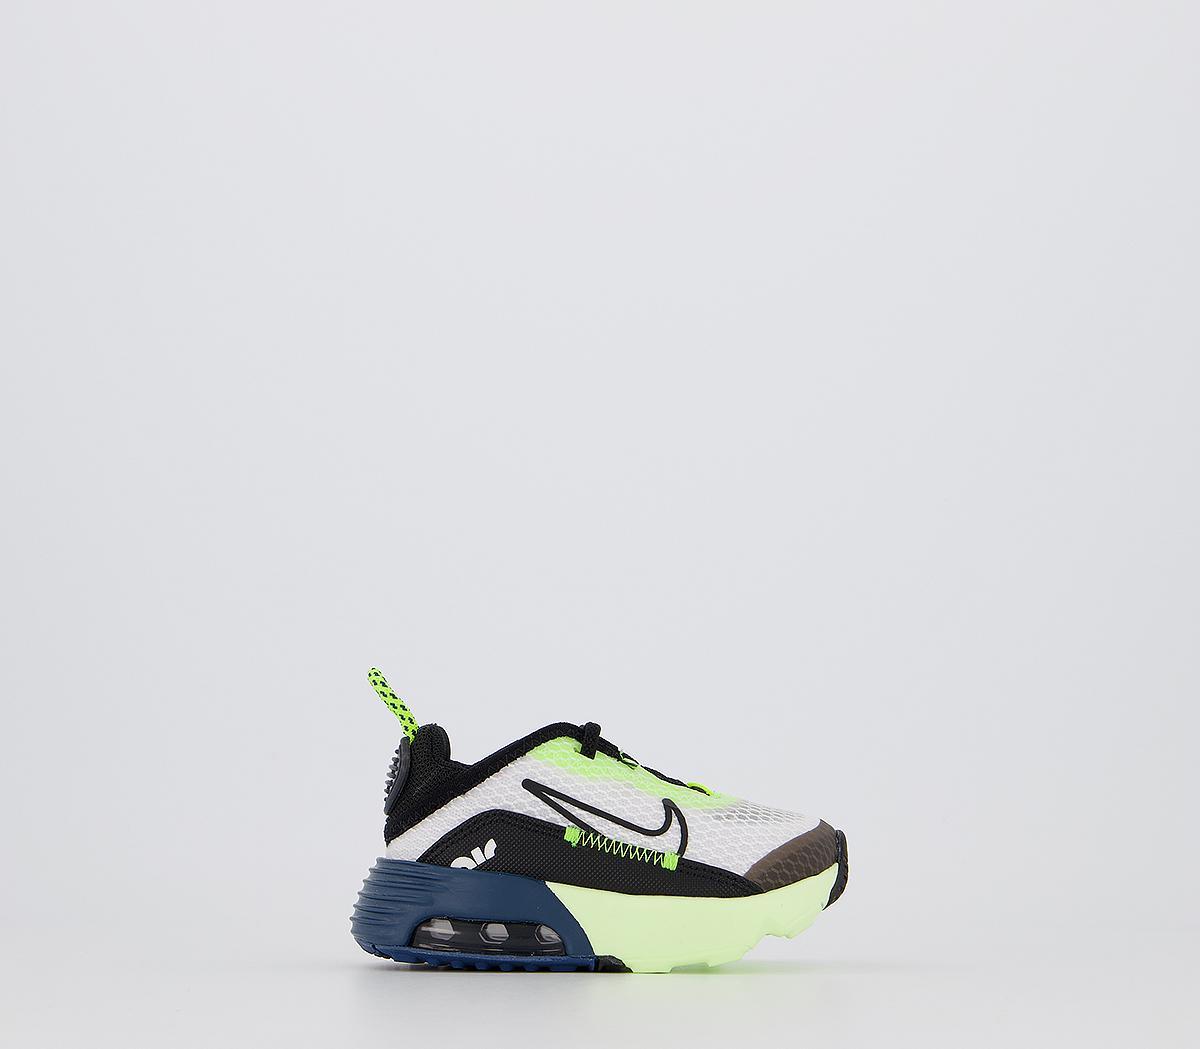 Nike Air Max 2090 Infant White Black